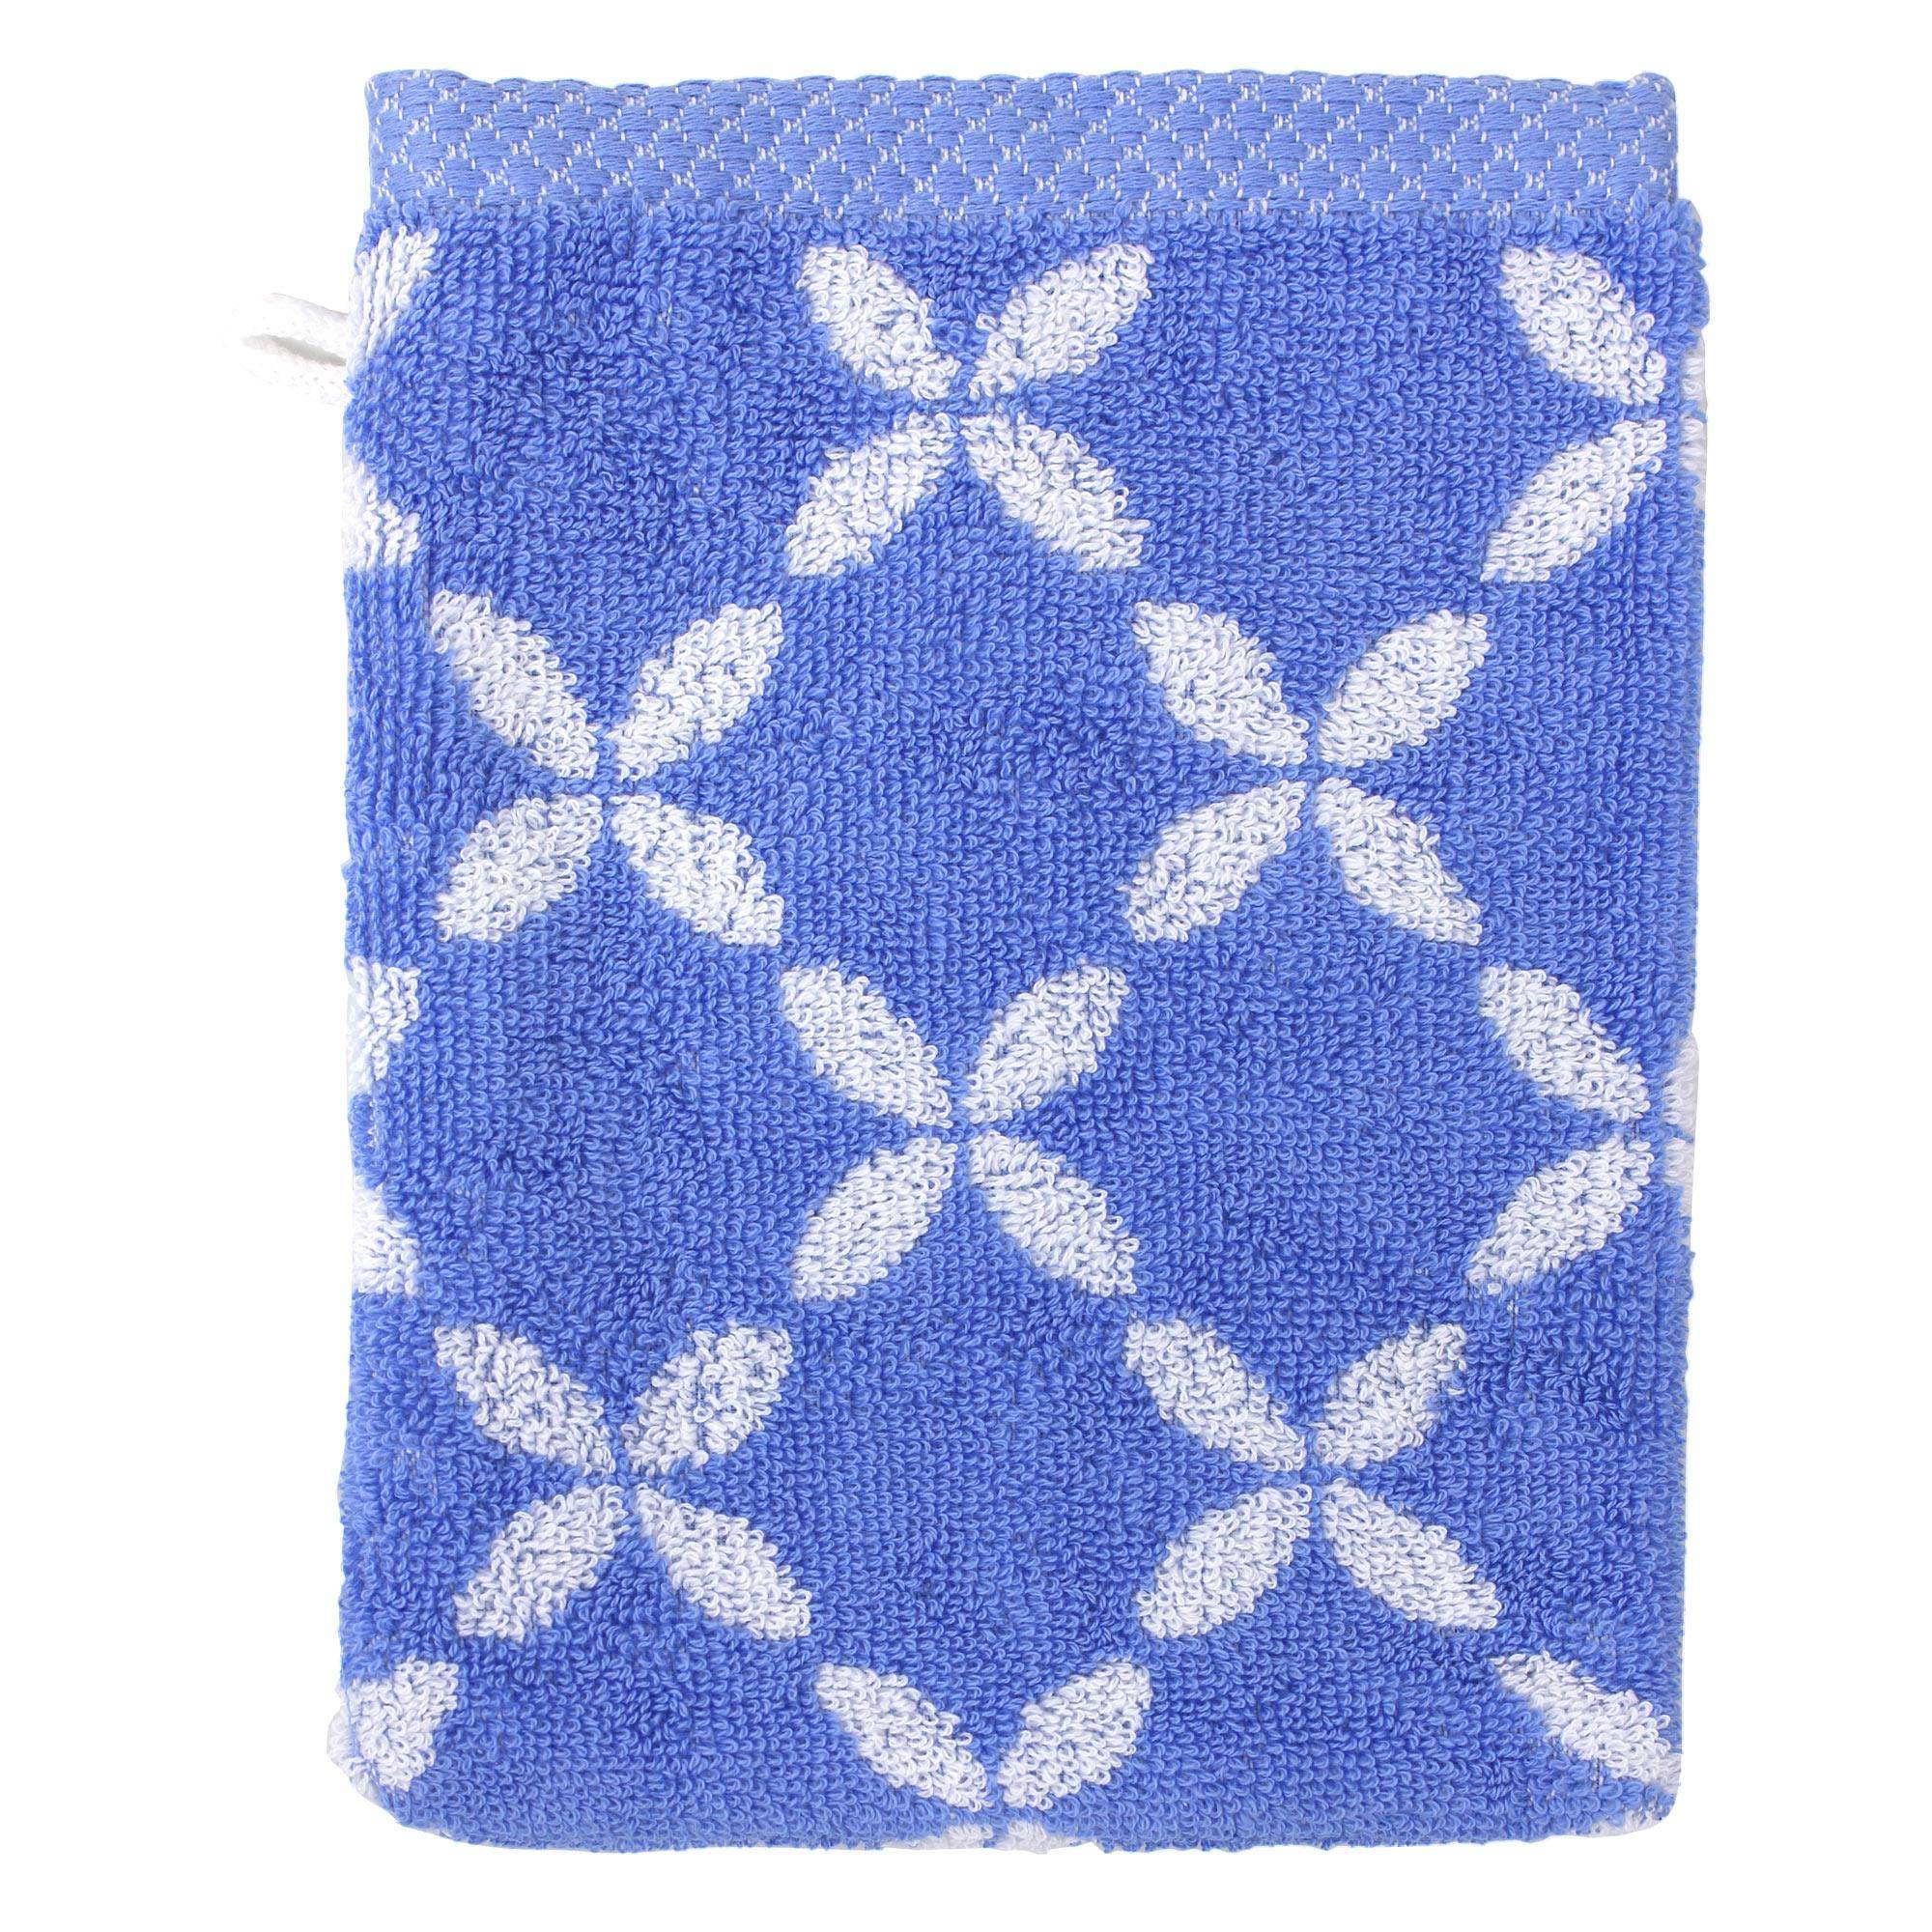 Linnea Gant de toilette 16x21 cm SHIBORI floral Bleu 500 g/m2